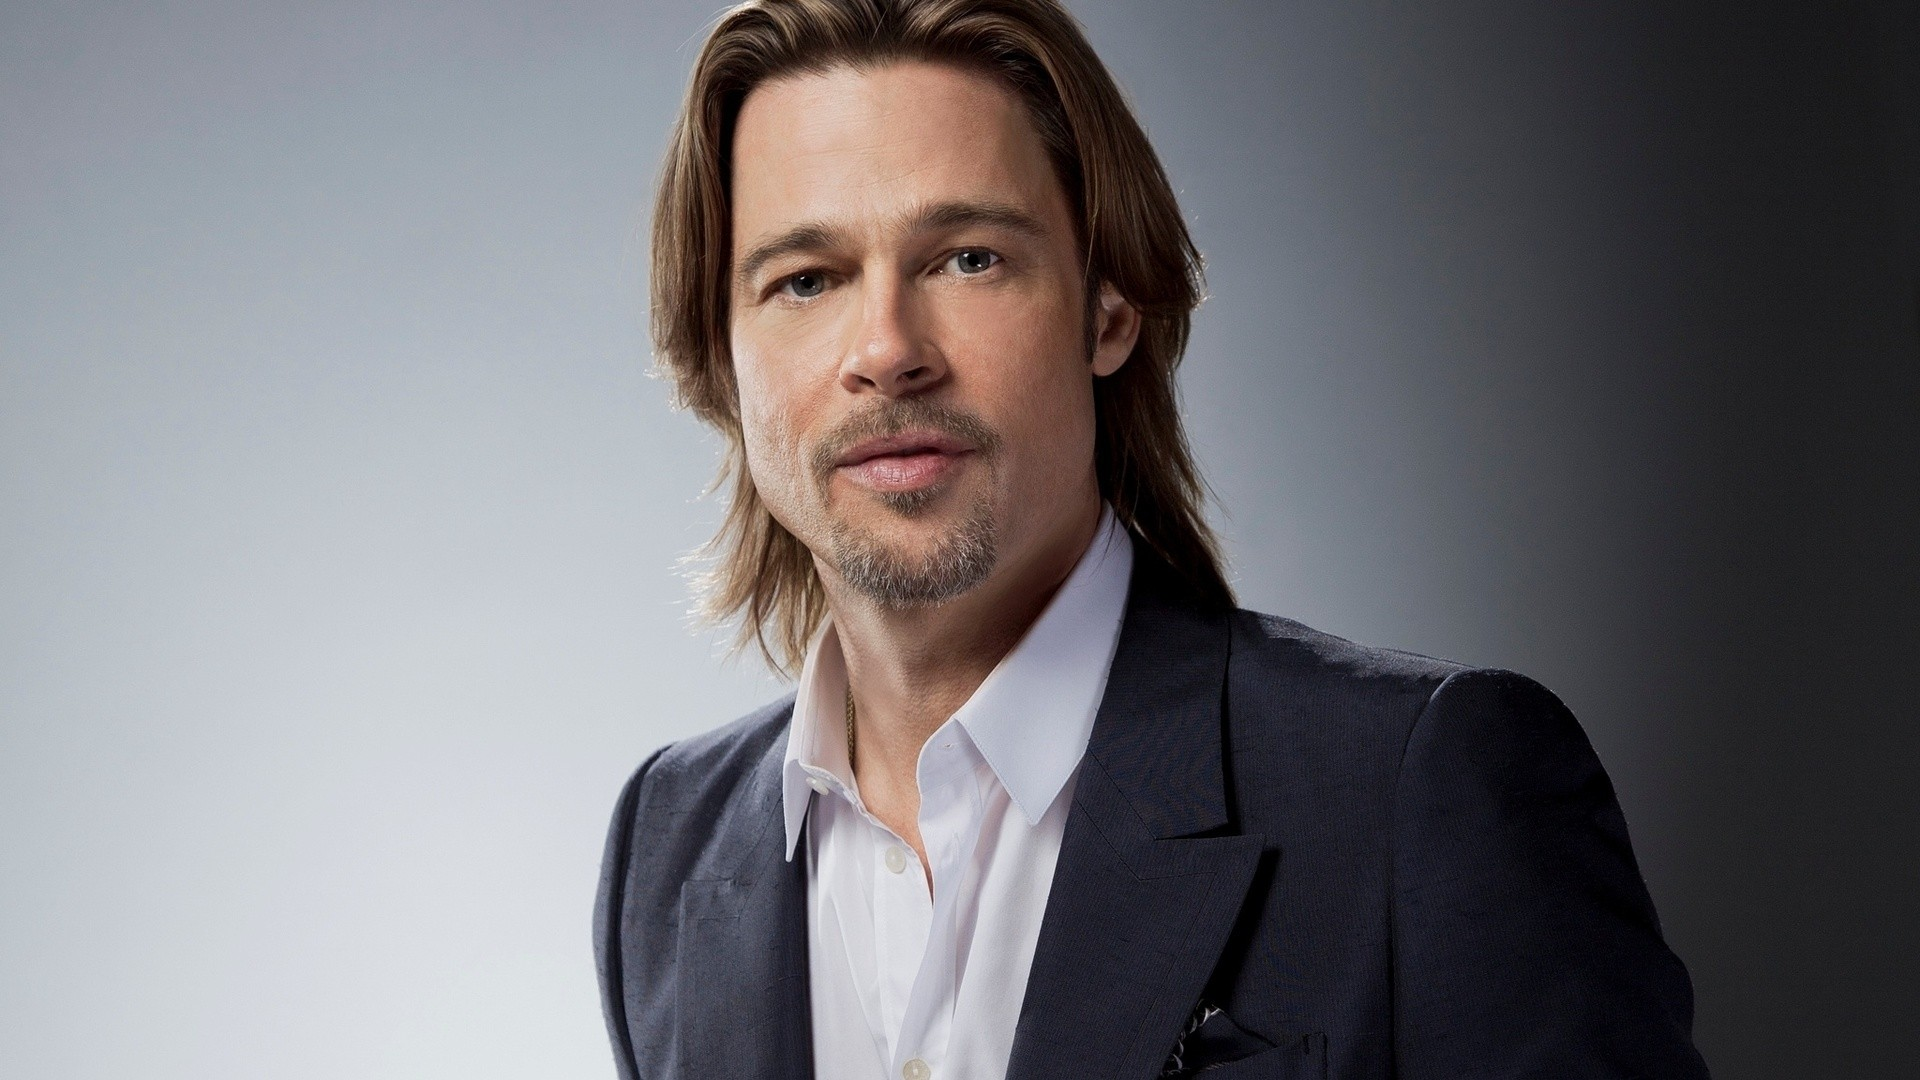 Brad Pitt Wallpaper image hd